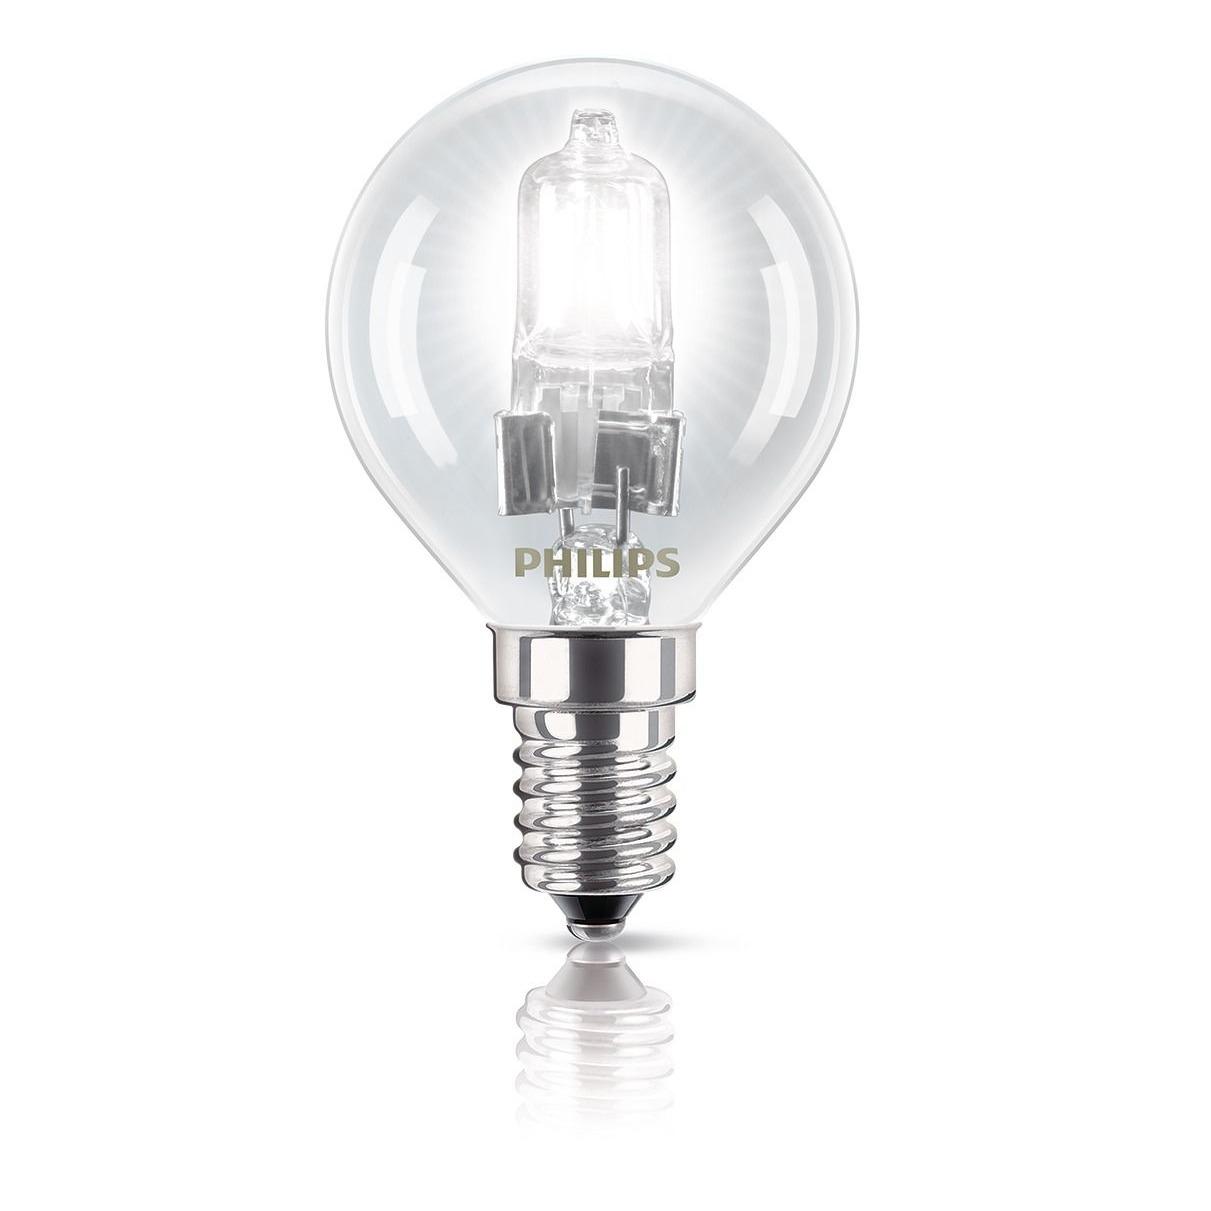 Philips halogeenlamp E14 18W 204Lm kogel